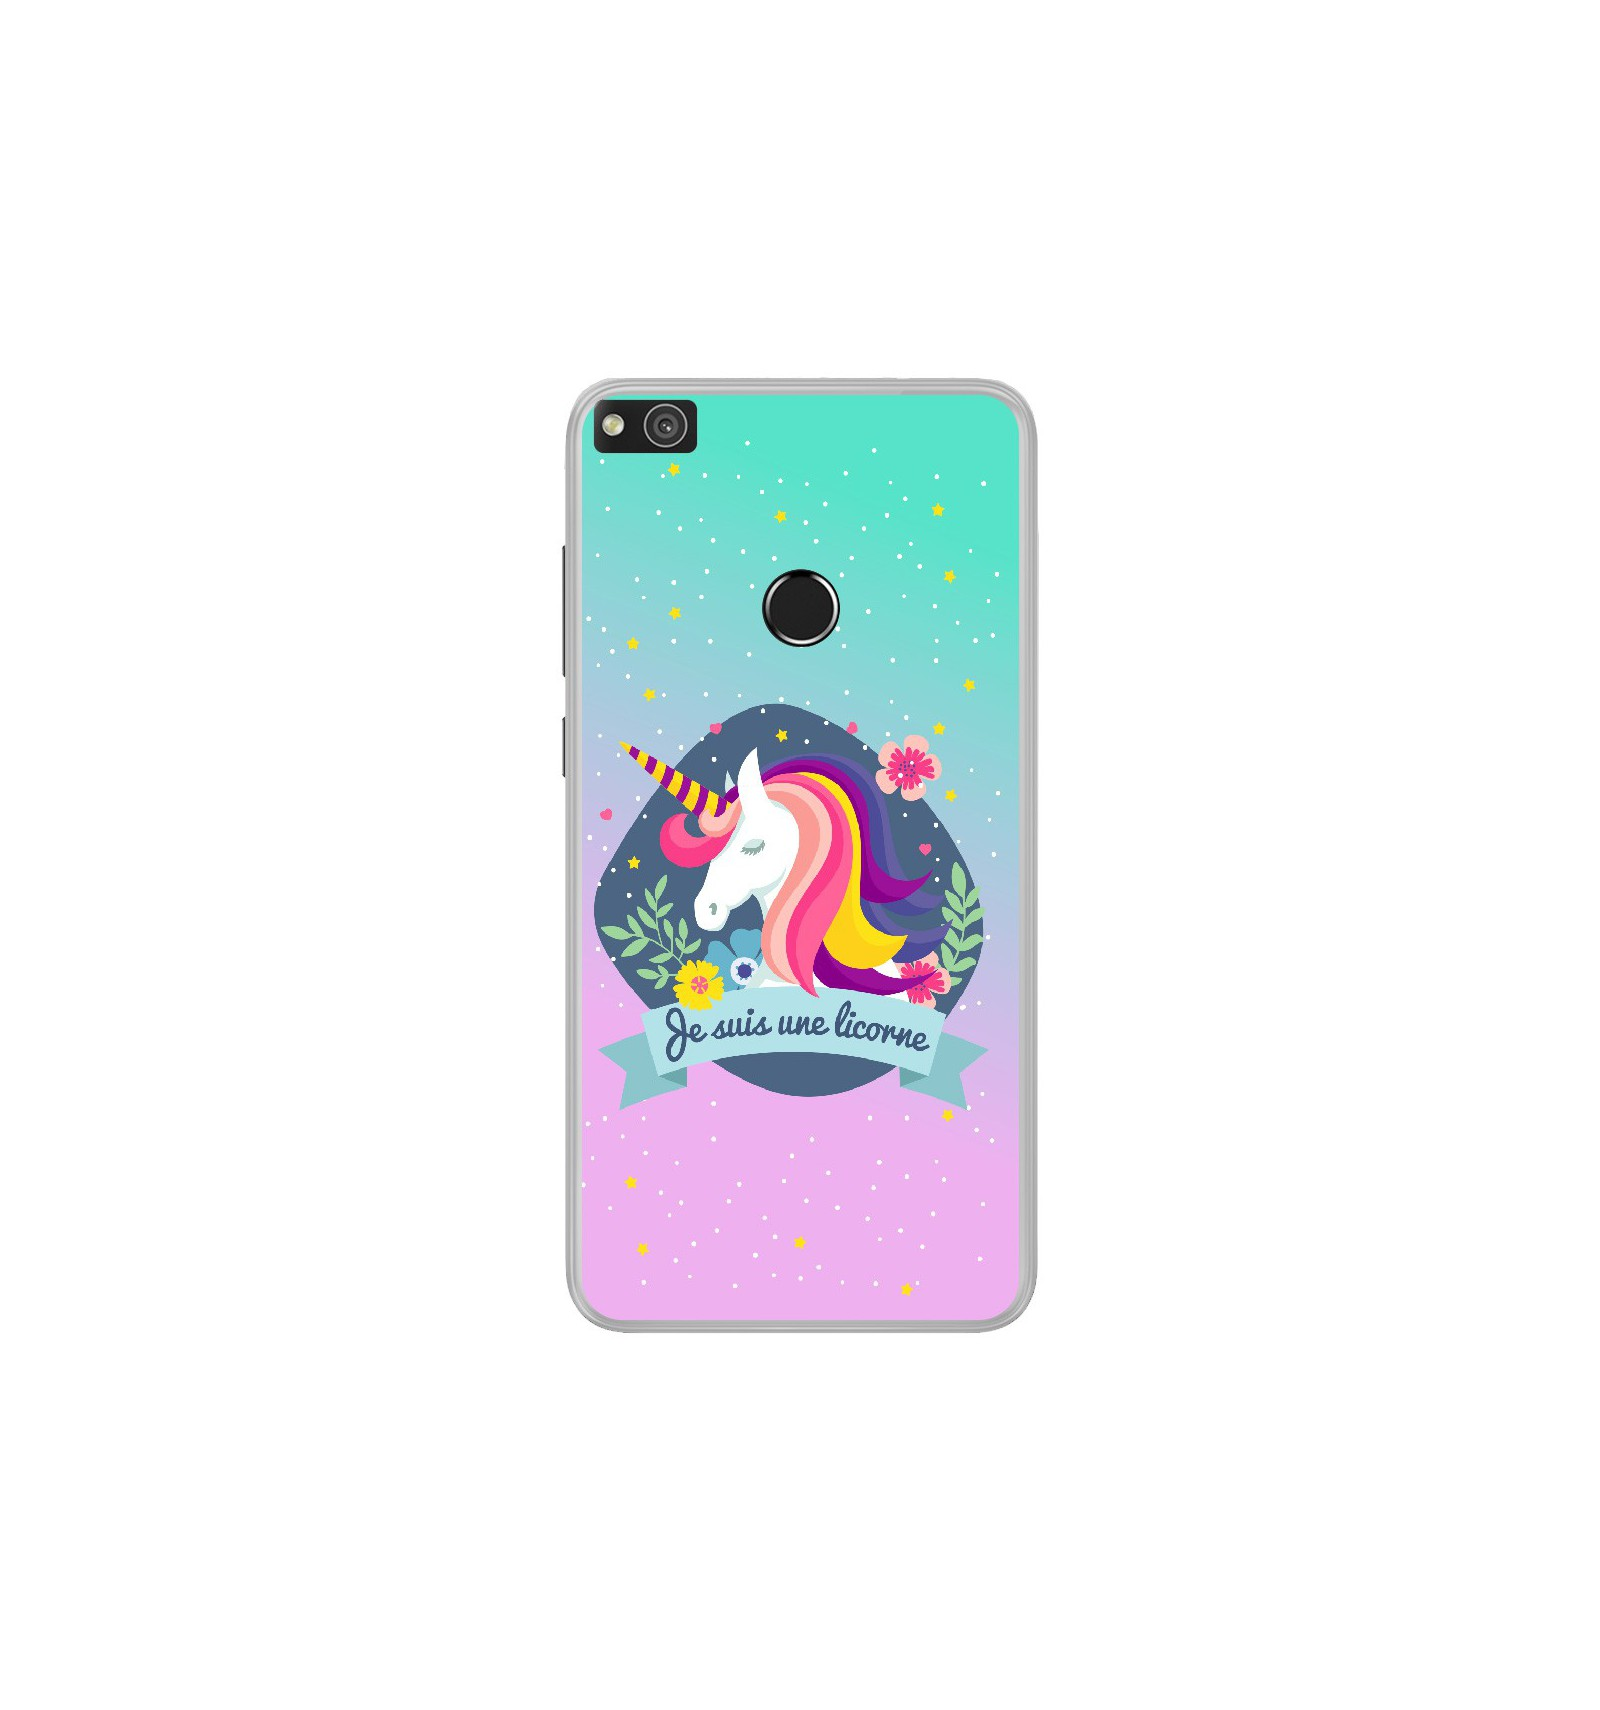 coque telephone huawei p8 lite 2017 licorne